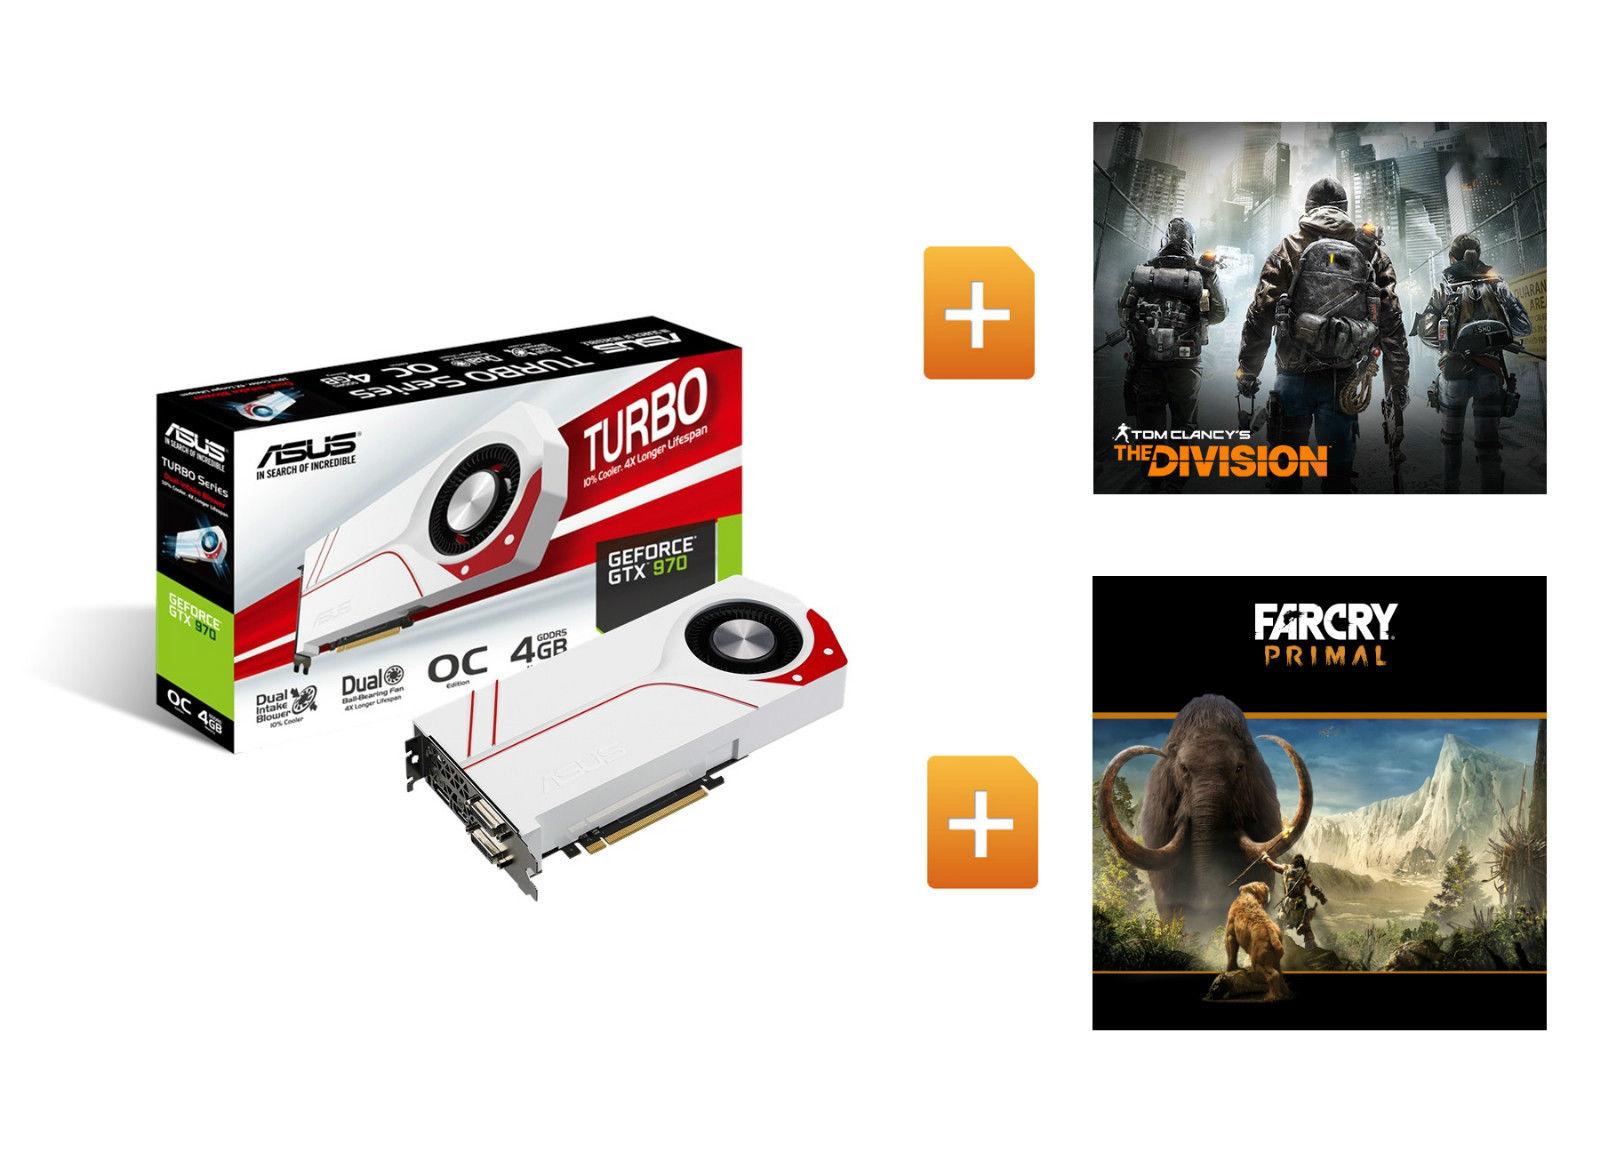 ASUS GeForce TURBO GTX970 OC 4GB The Division Far Cry Primal Gaming Grafikkarte